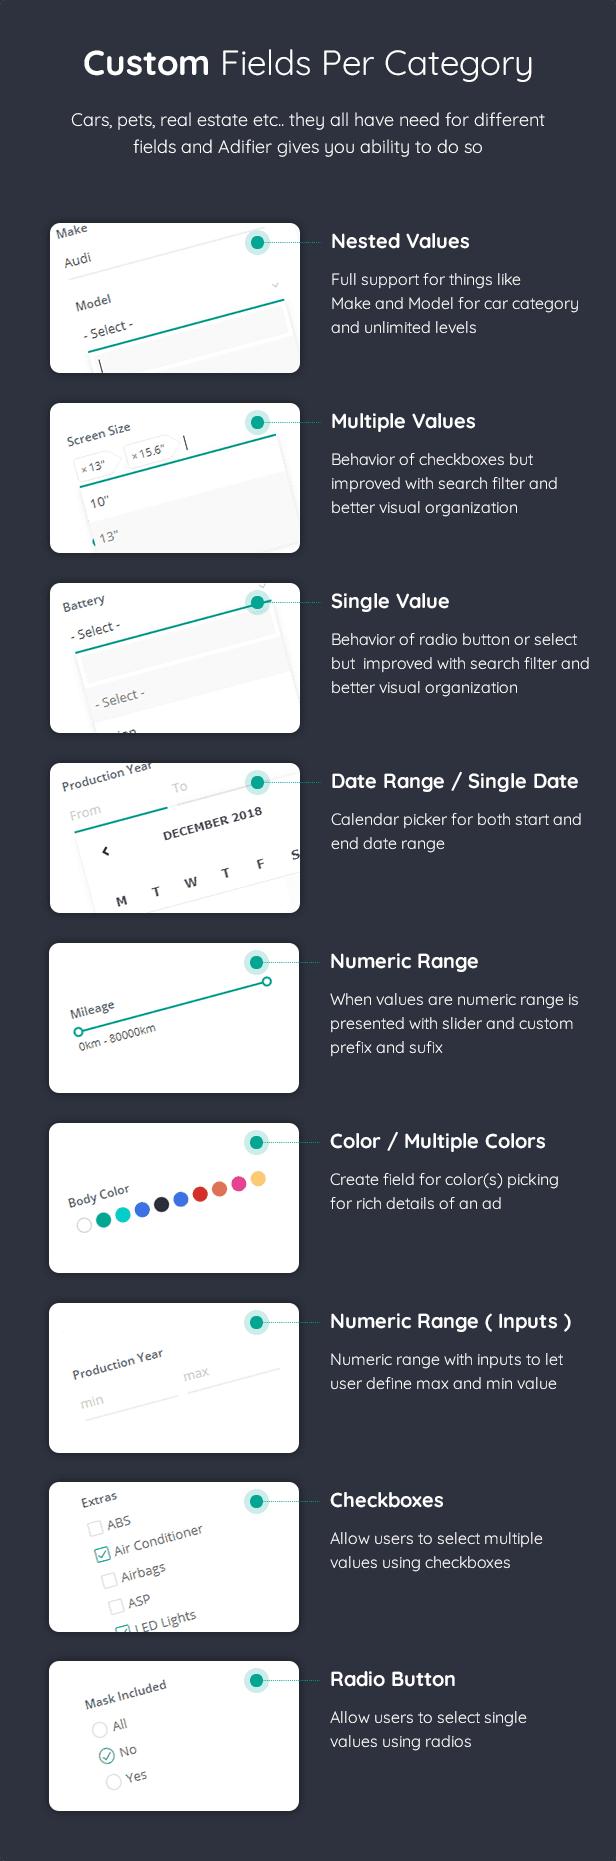 Adifier - Classified Ads WordPress Theme - 9